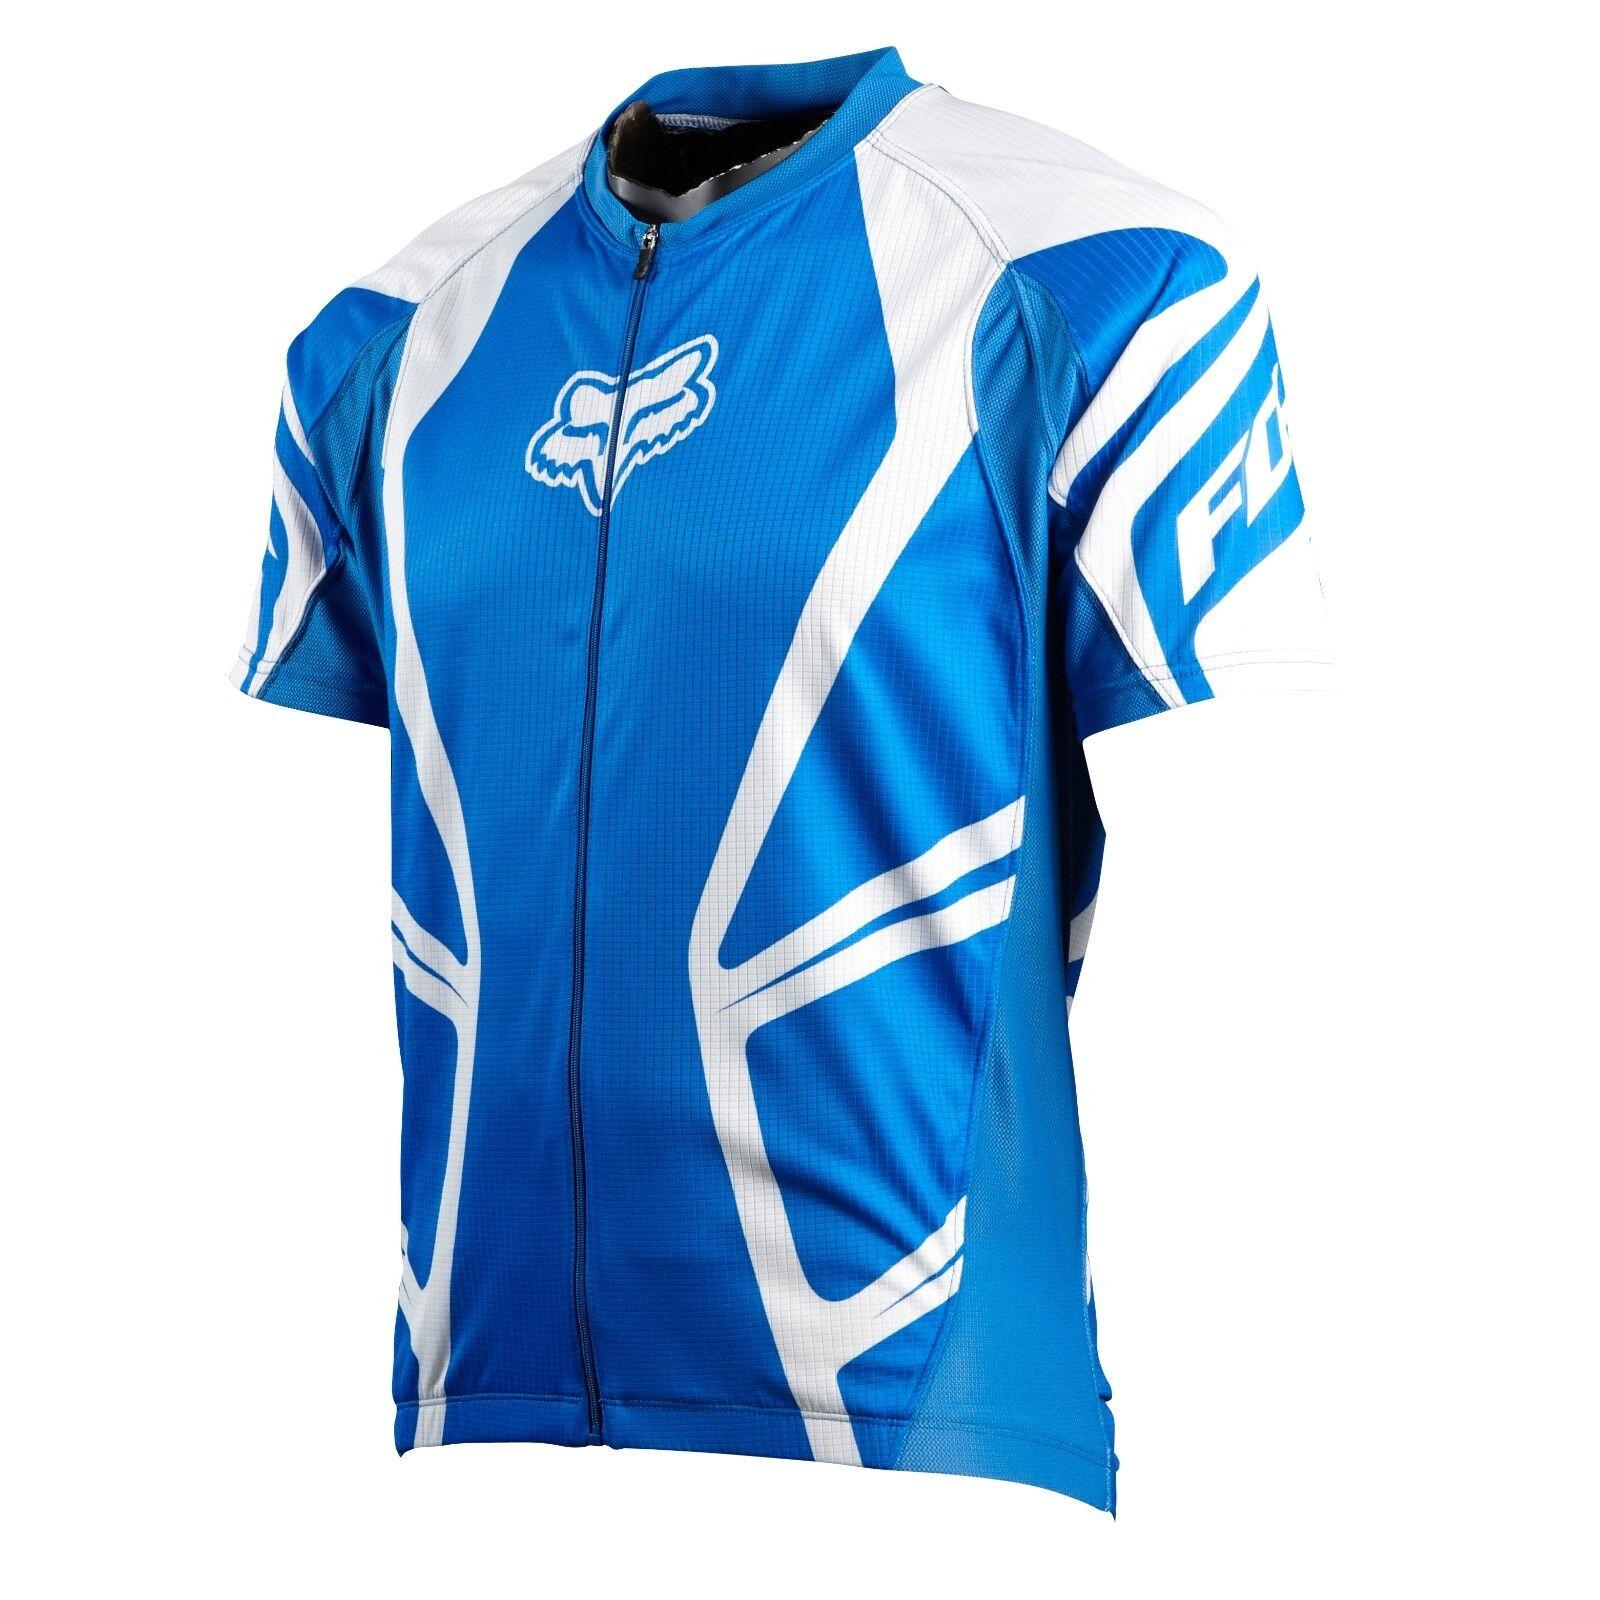 Fox Racing Race Jersey Jersey blu, Medium  vendite dirette della fabbrica